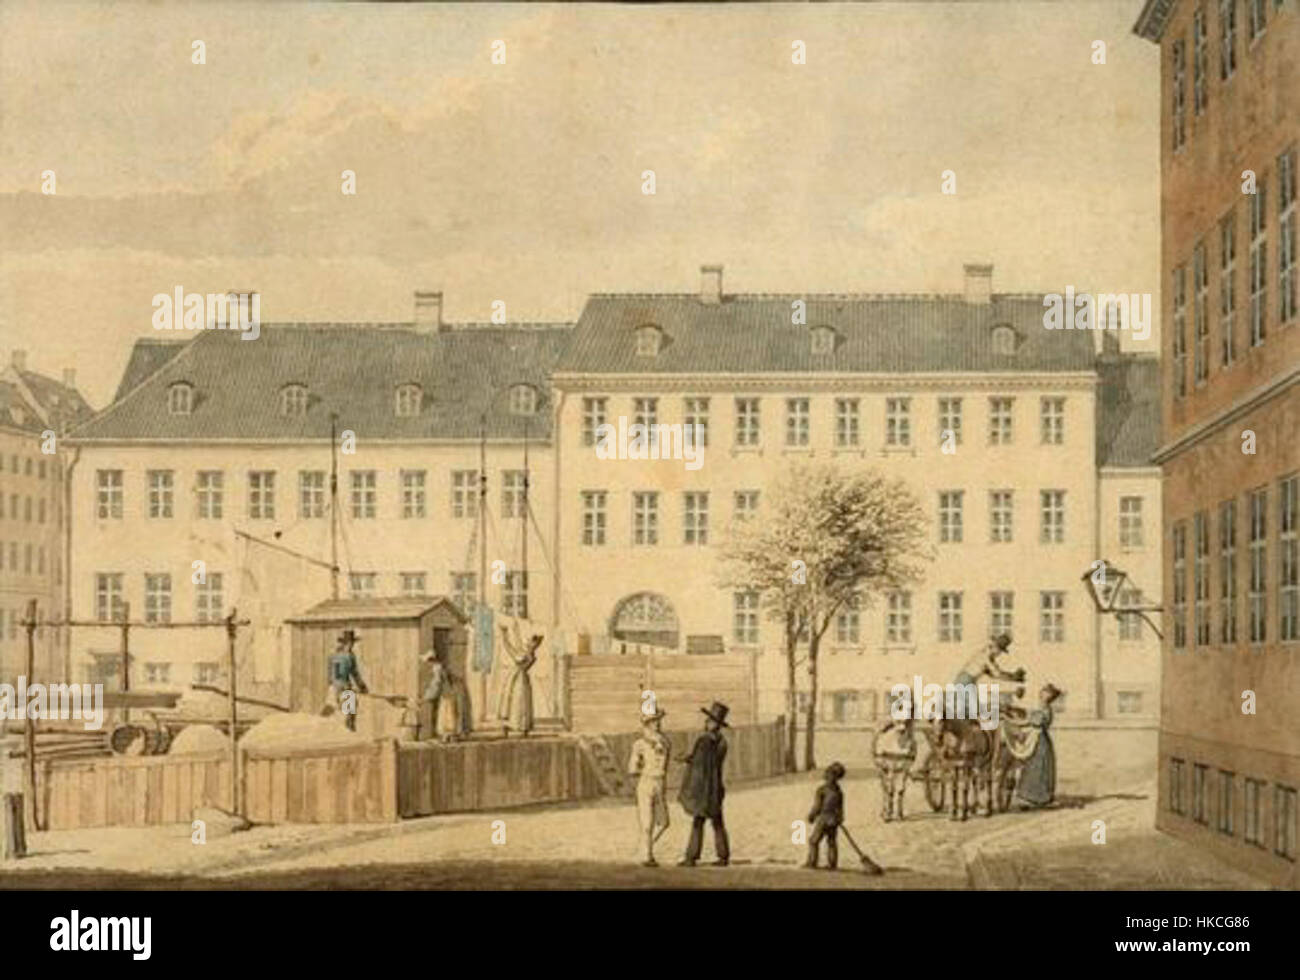 H. G. F. Holm   Frederiksholms Kanal, 1835 - Stock Image